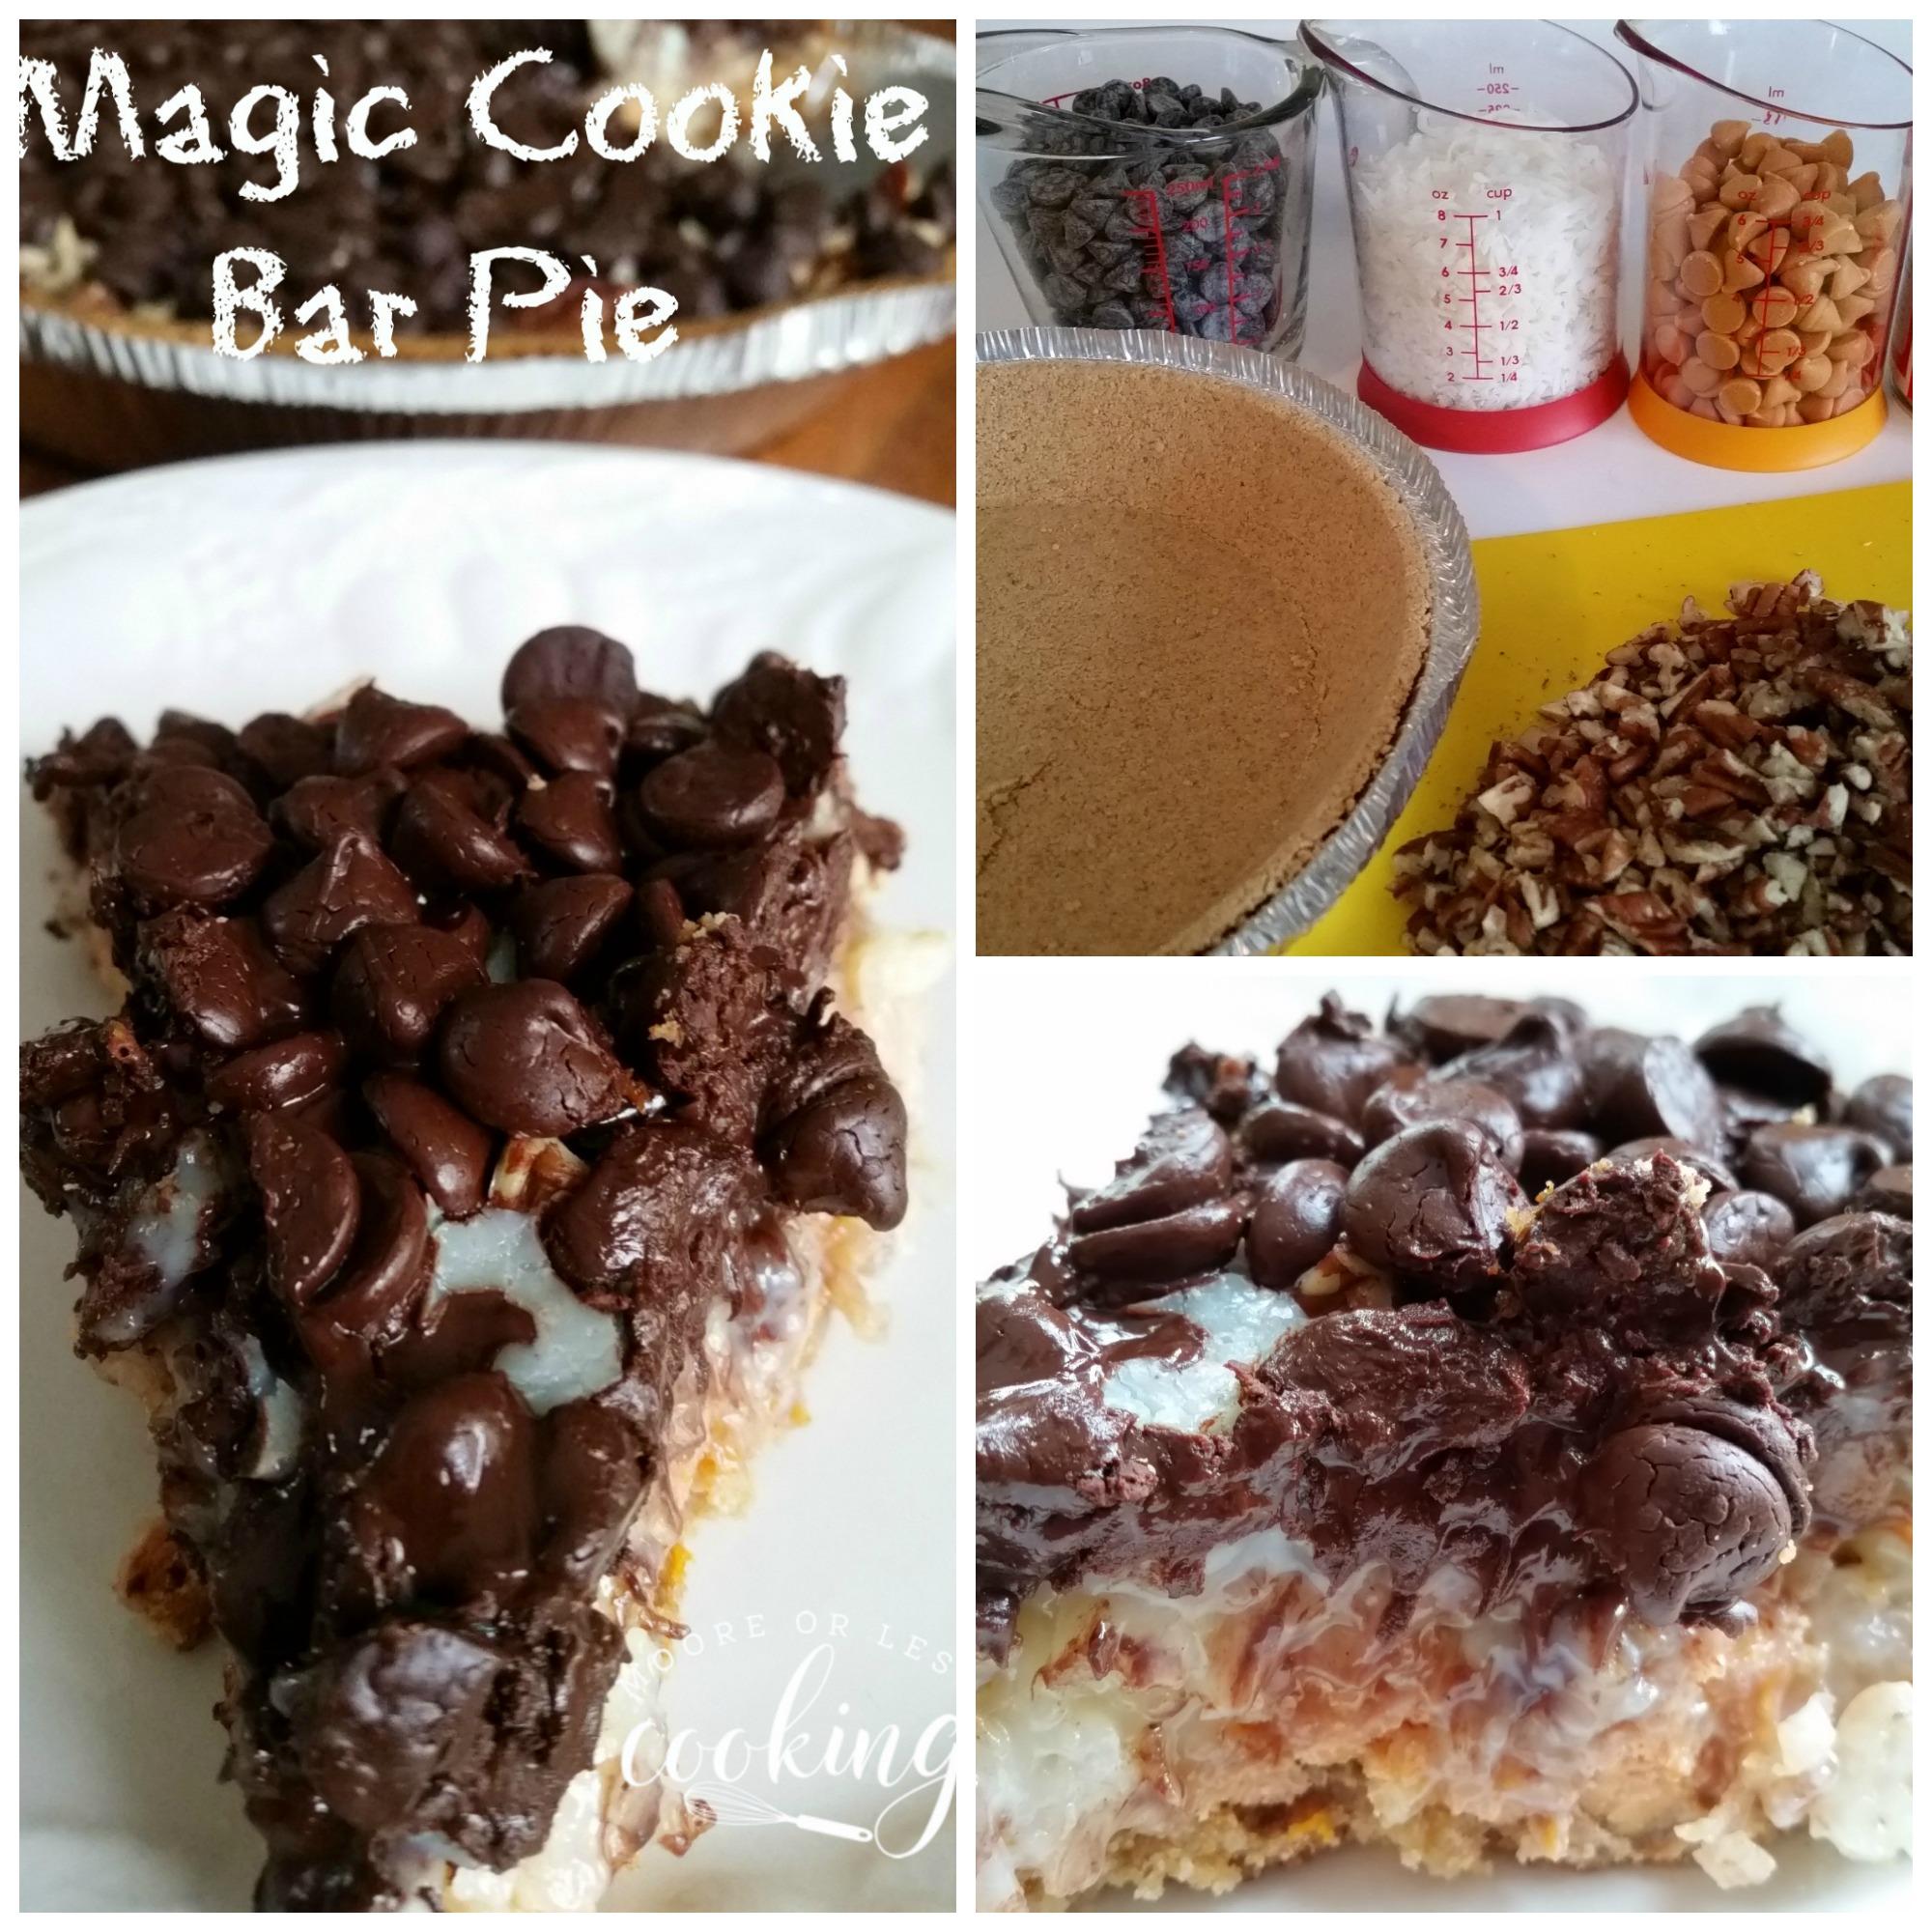 Magic Cookie Bar Pie